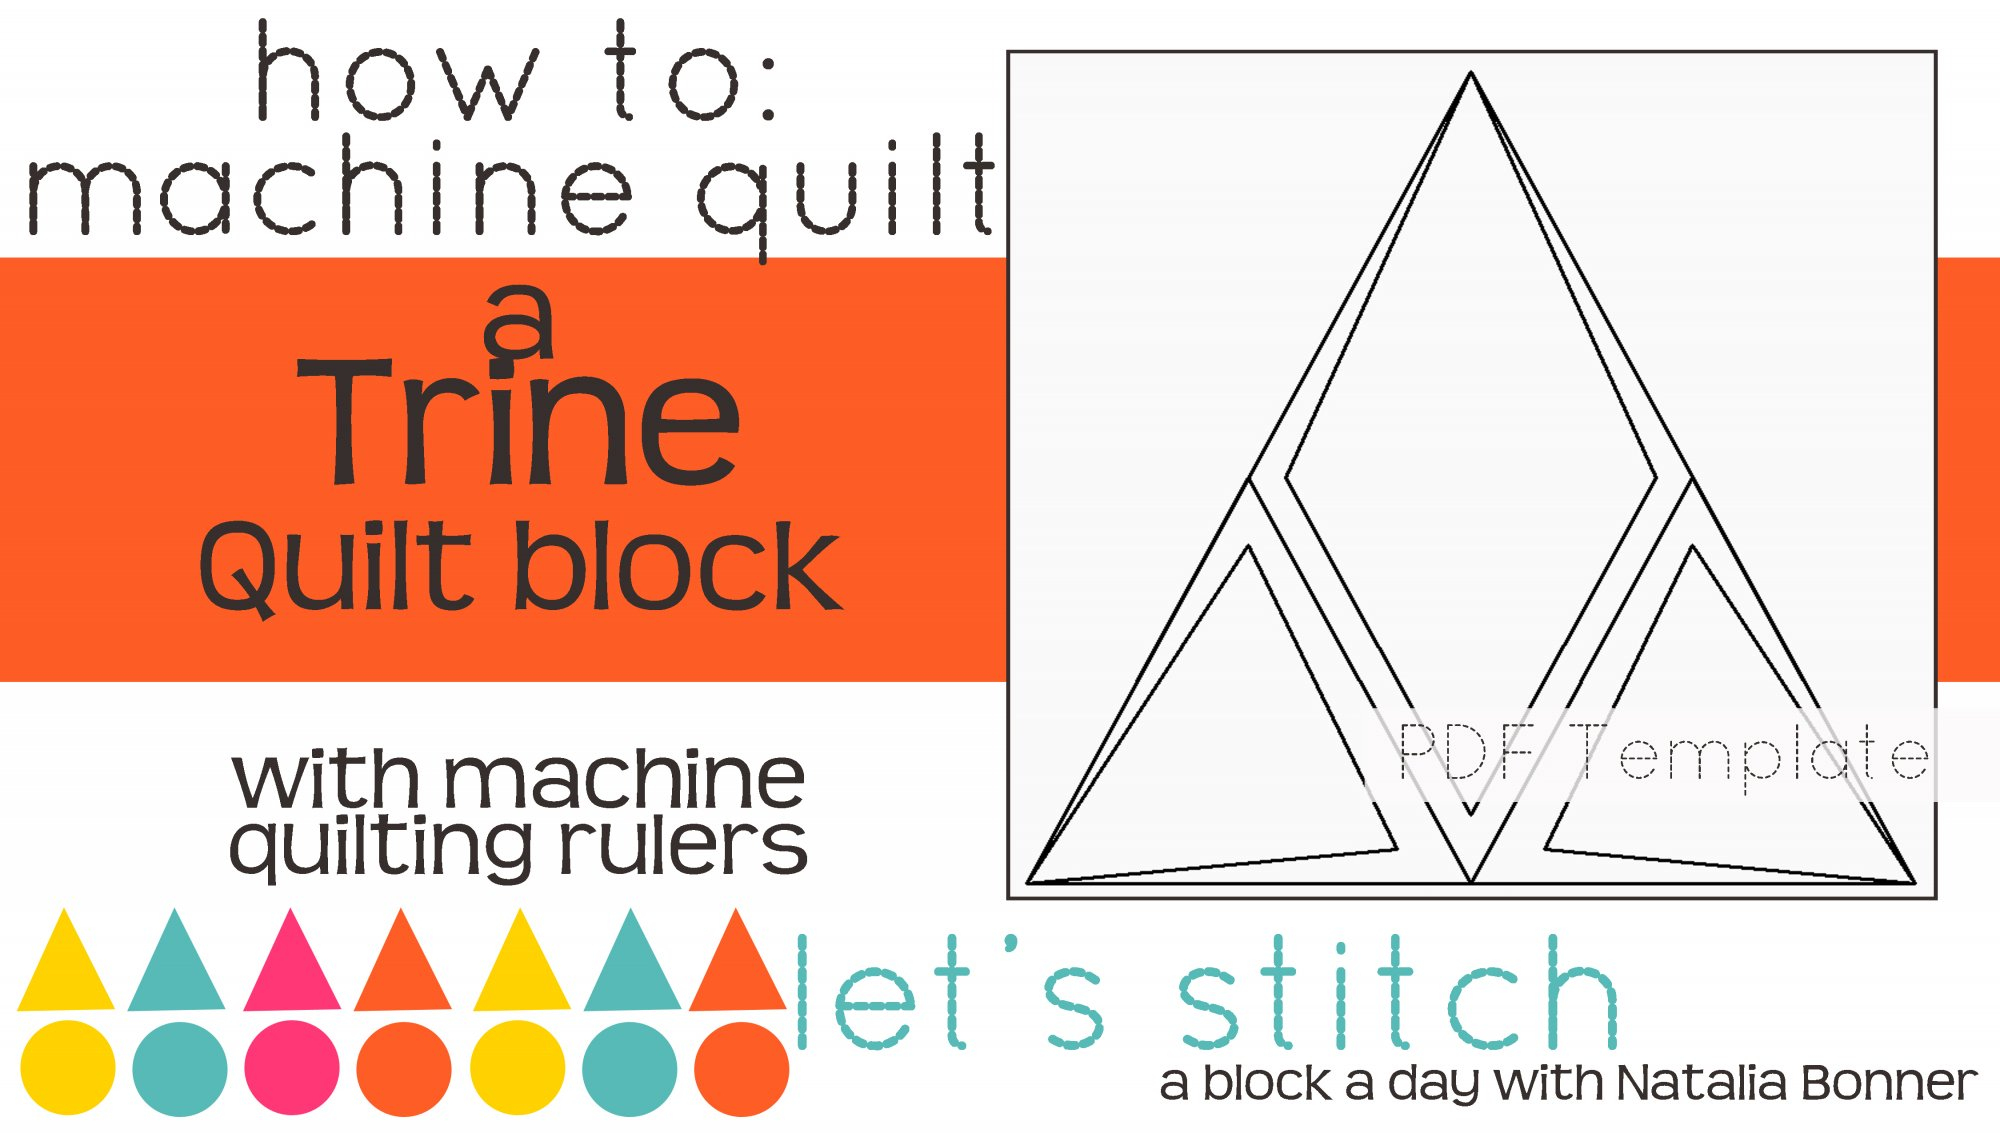 Let's Stitch - A Block a Day With Natalia Bonner - PDF - Trine